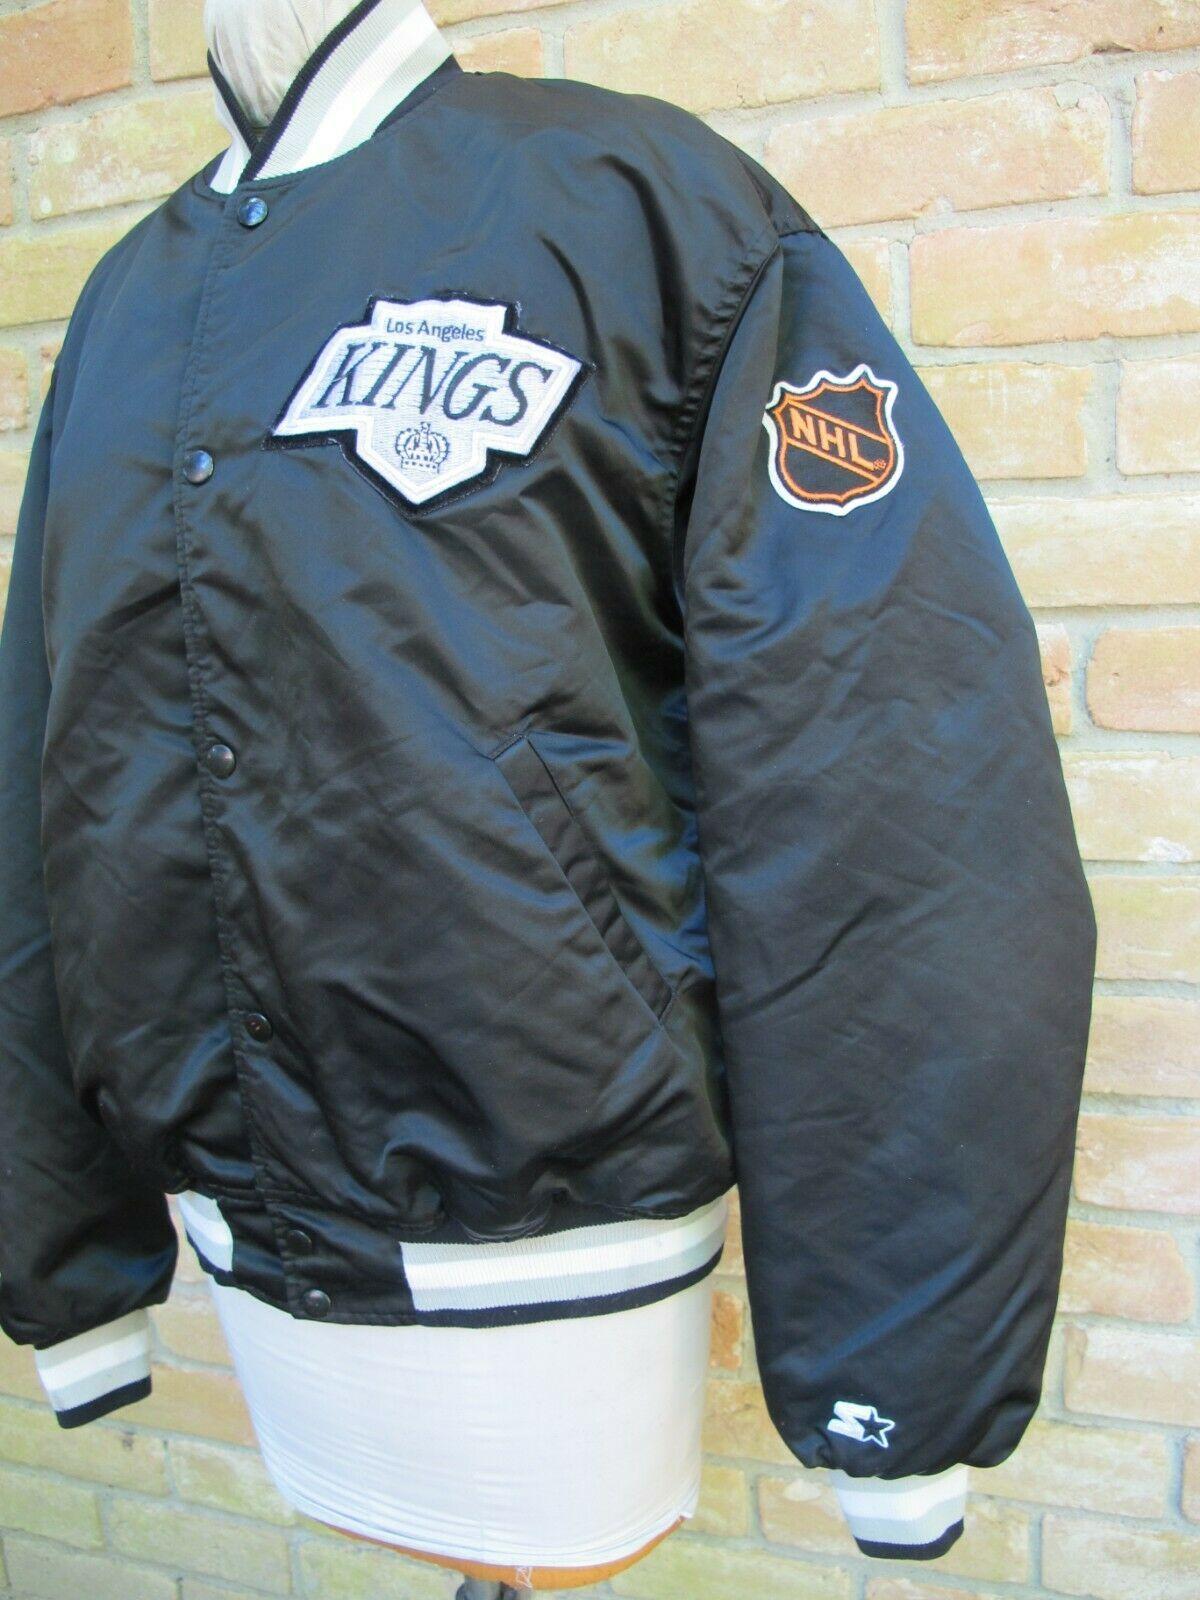 Vintage Starter Black Satin Nhl Jacket Los Angeles Kings Hockey Gretzky Era Xl Ebay Jackets Satin Jackets Vintage Outfits